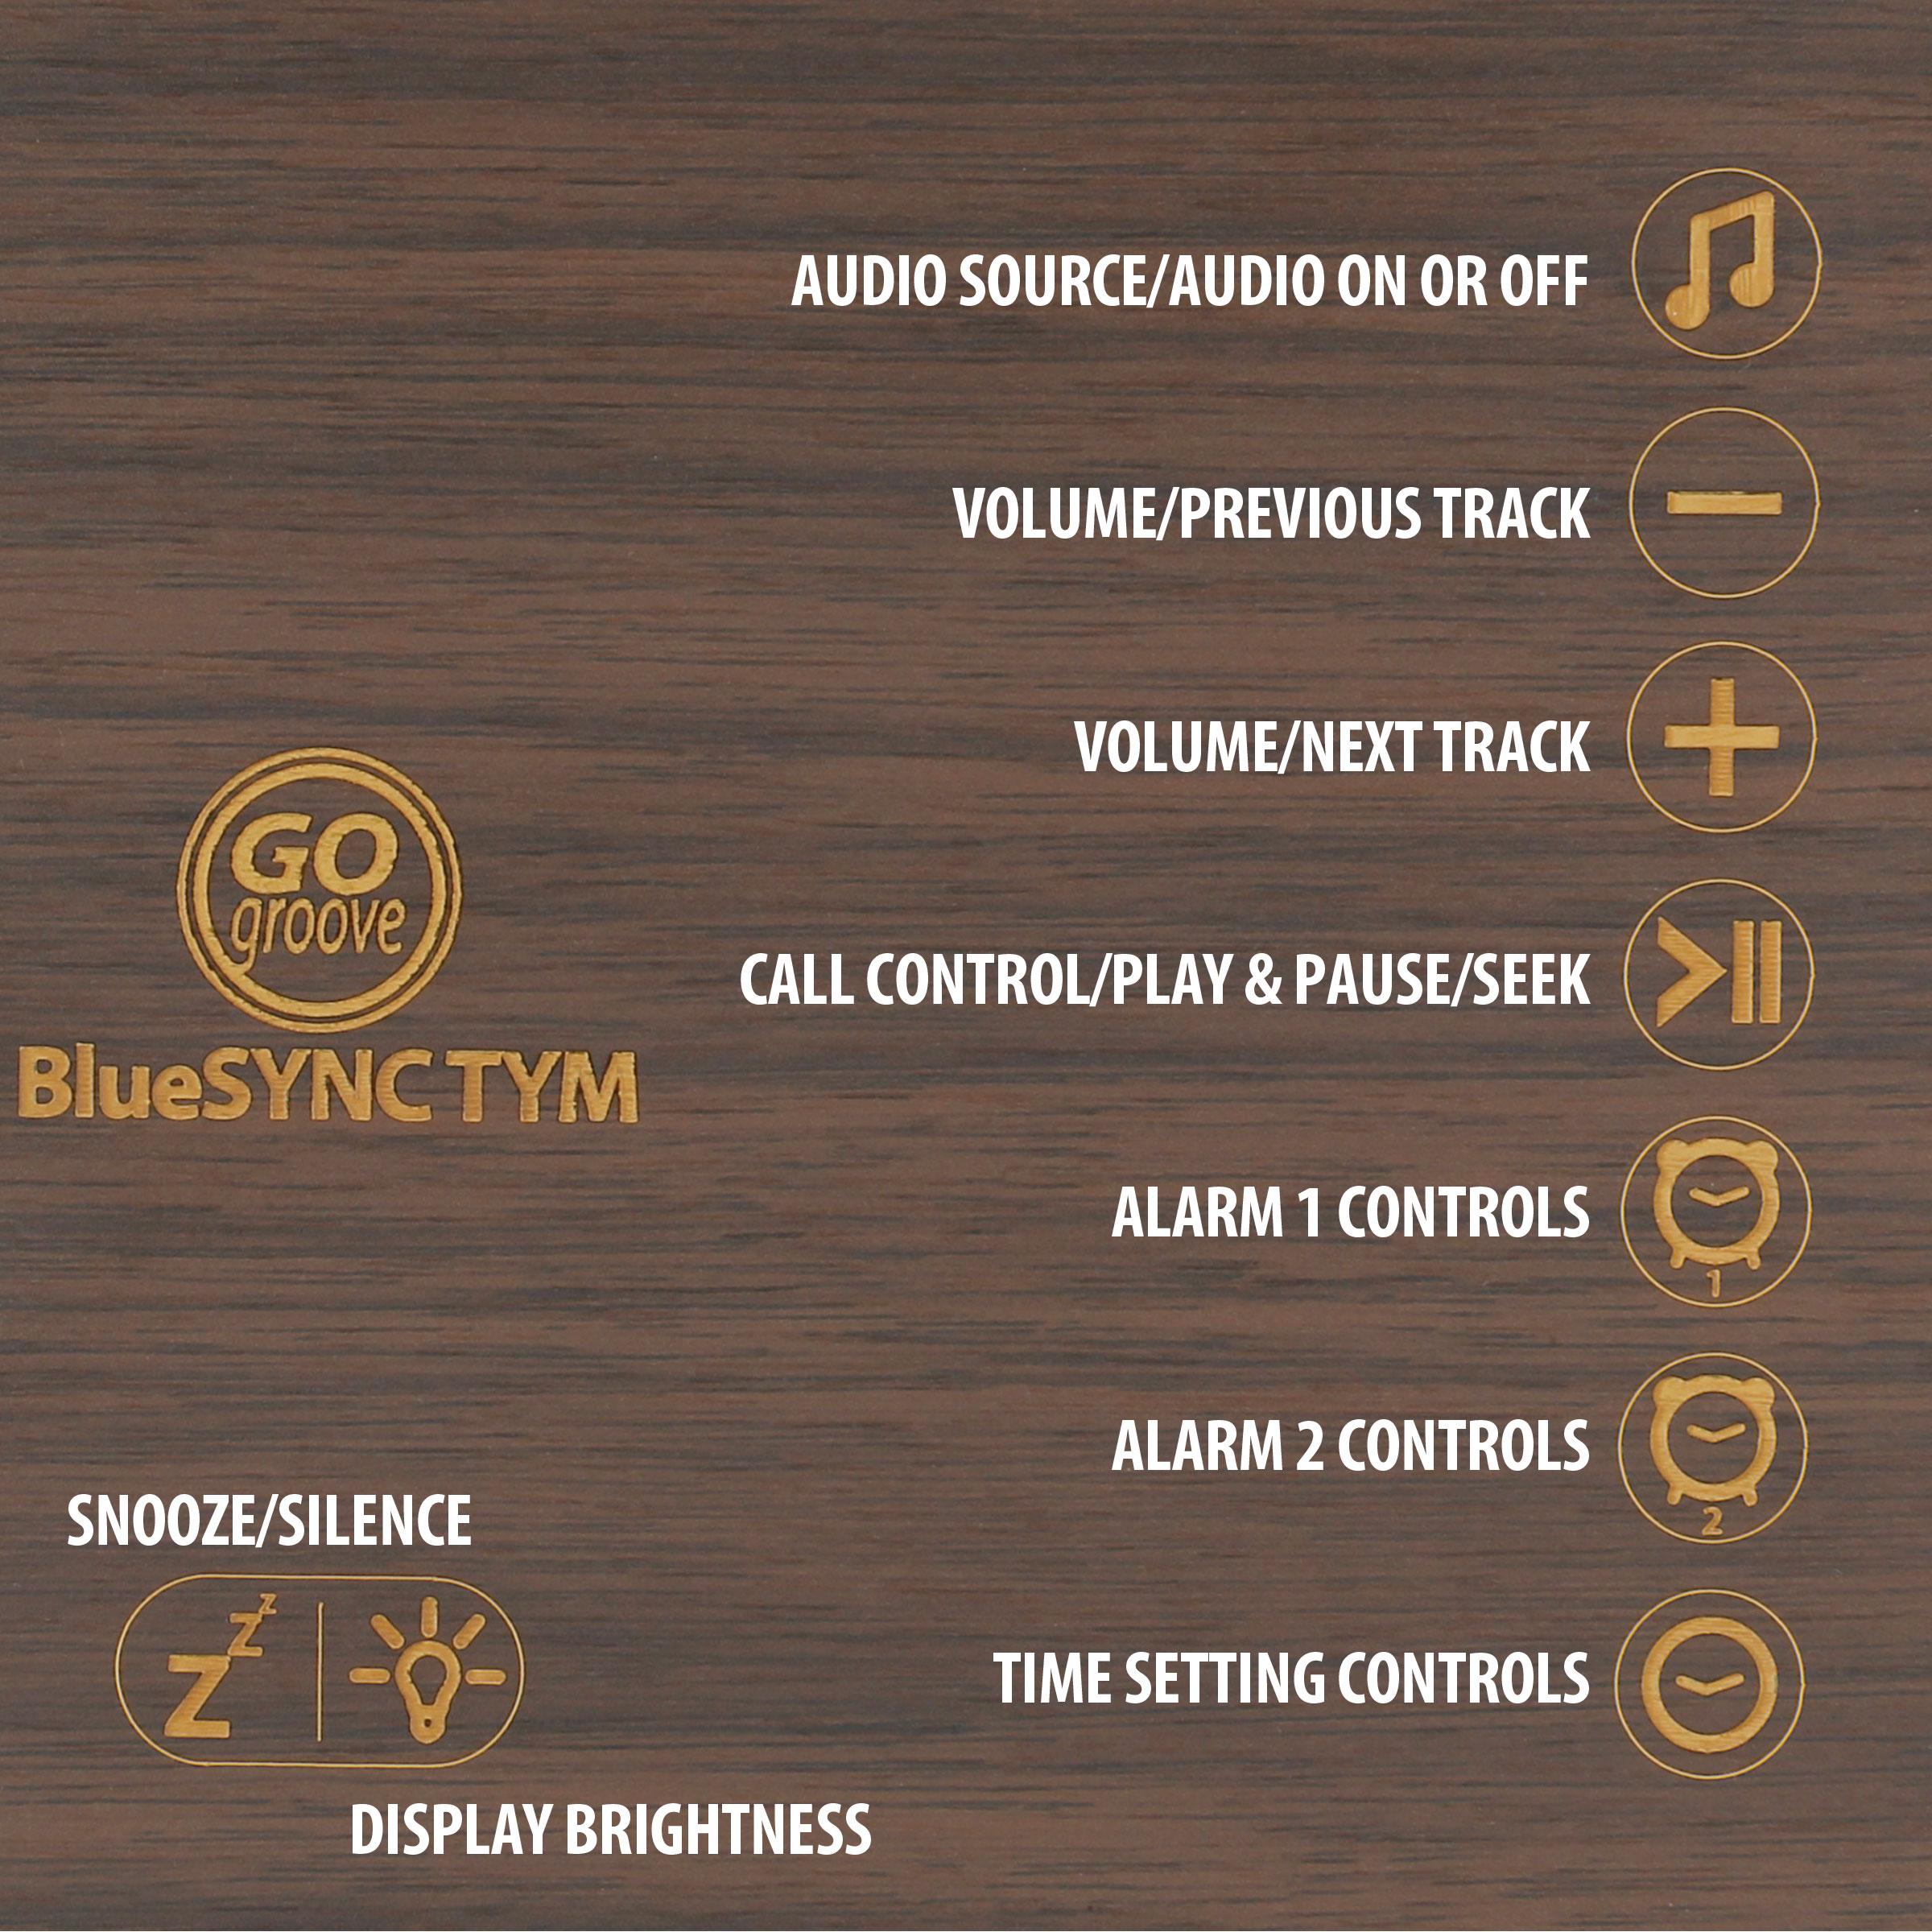 Bluetooth Alarm Clock Radio Speaker by GOgroove - Wood , FM Radio , Dual Alarms , USB Charging Ports 7